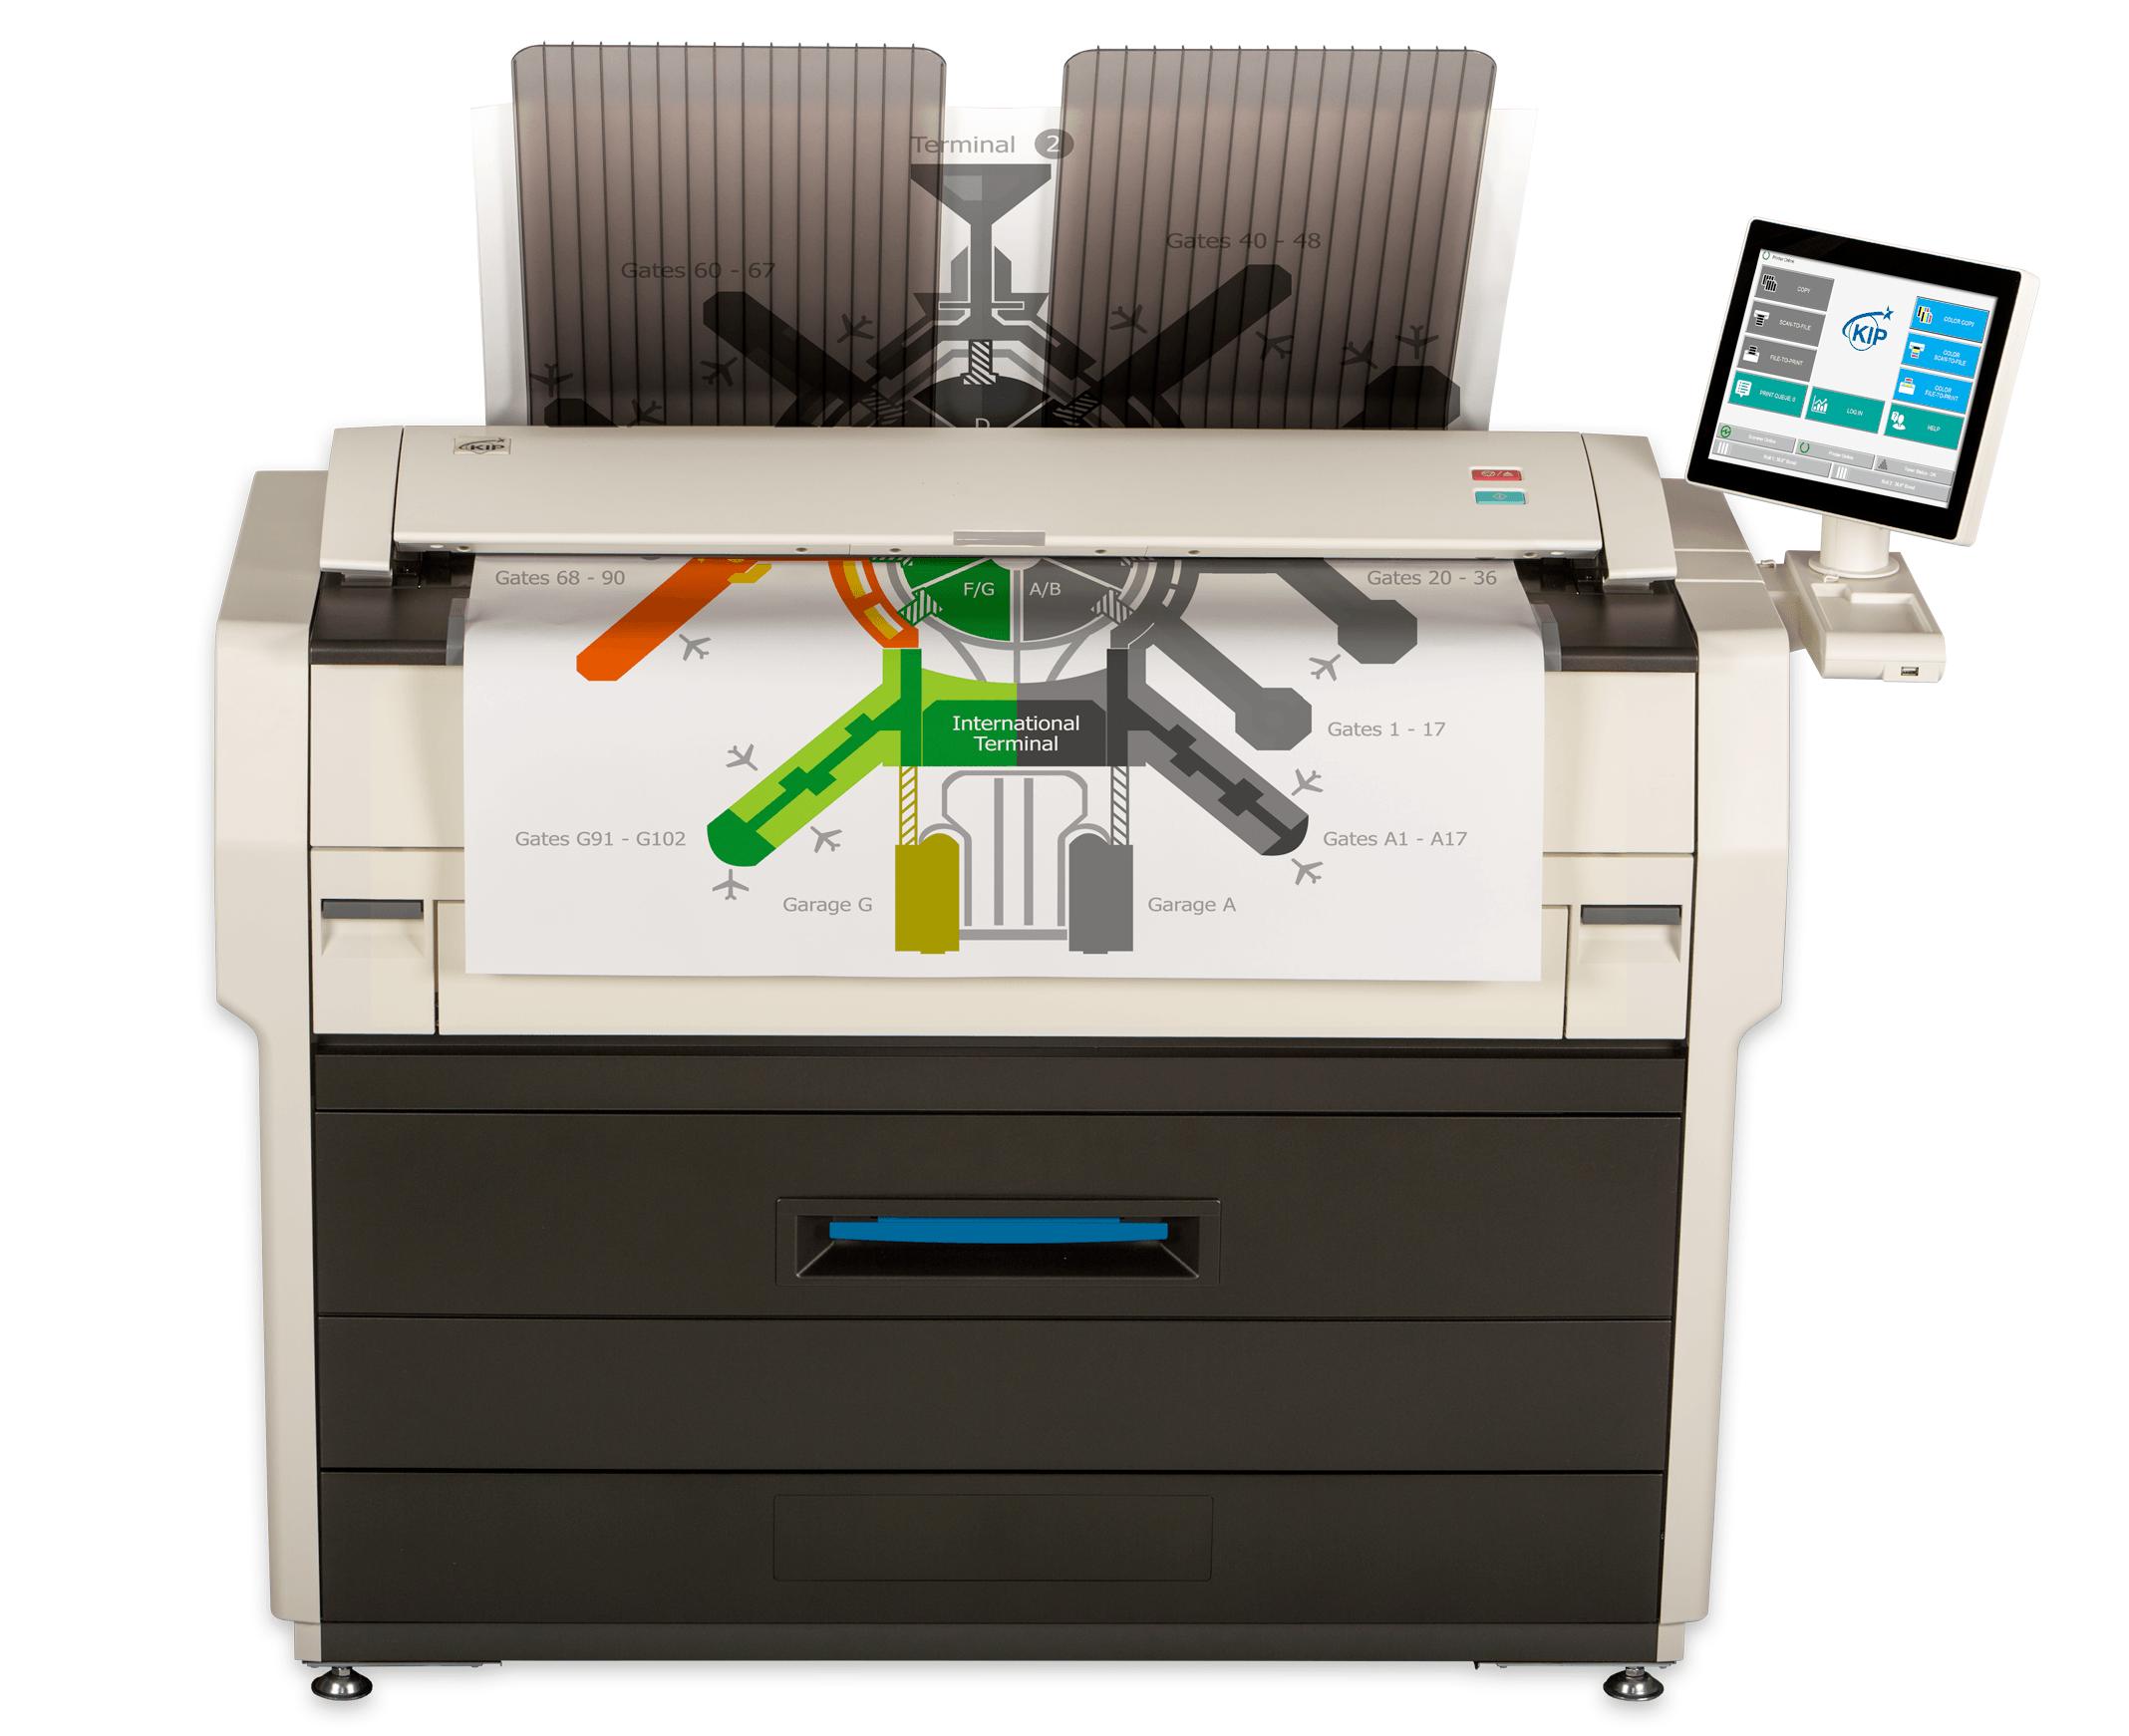 KIP 7170 Reprographics printer